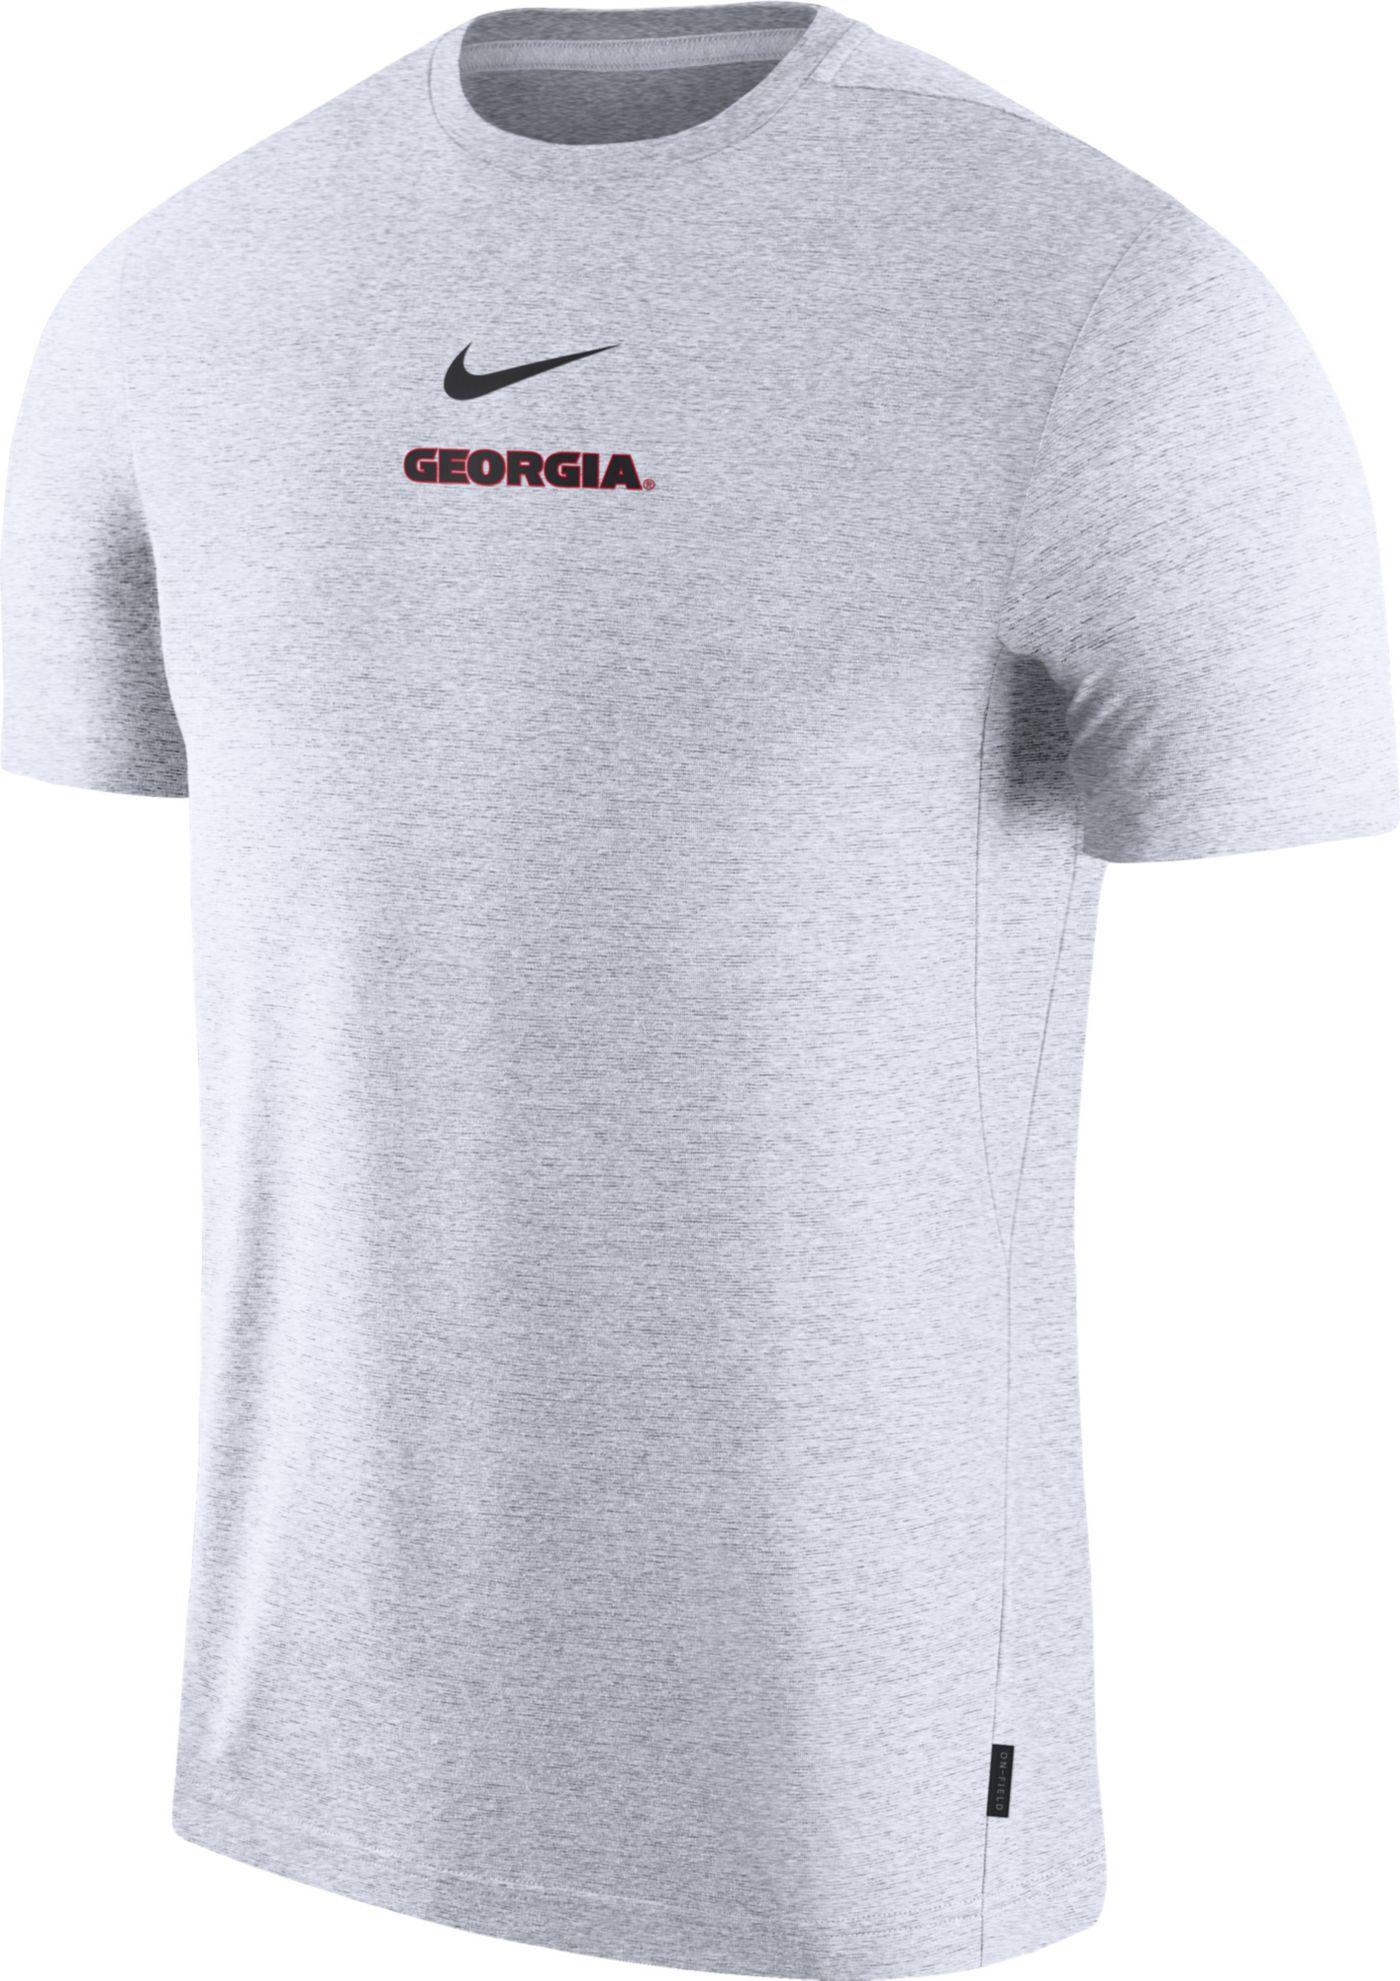 Nike Men's Georgia Bulldogs Dri-FIT Coach UV Football White T-Shirt